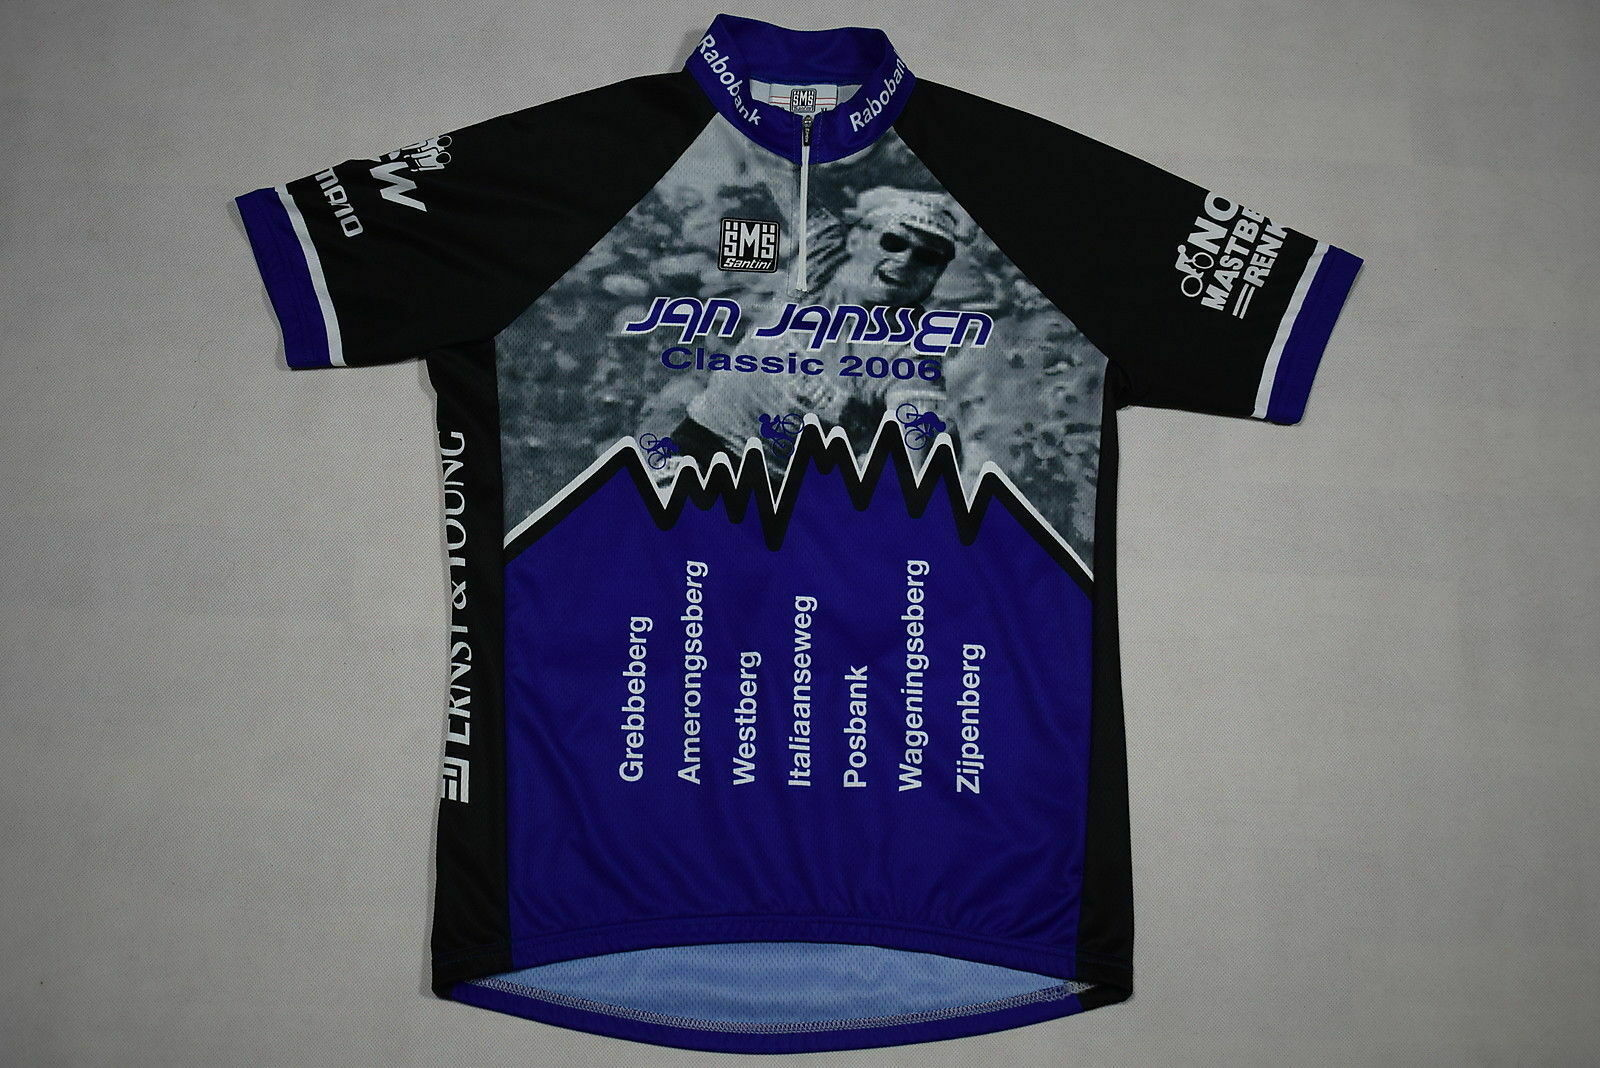 SMS Santini Jan Janssen Trikot Rad Bike Jersey Maillot Maglia Camiseta Shirt XL